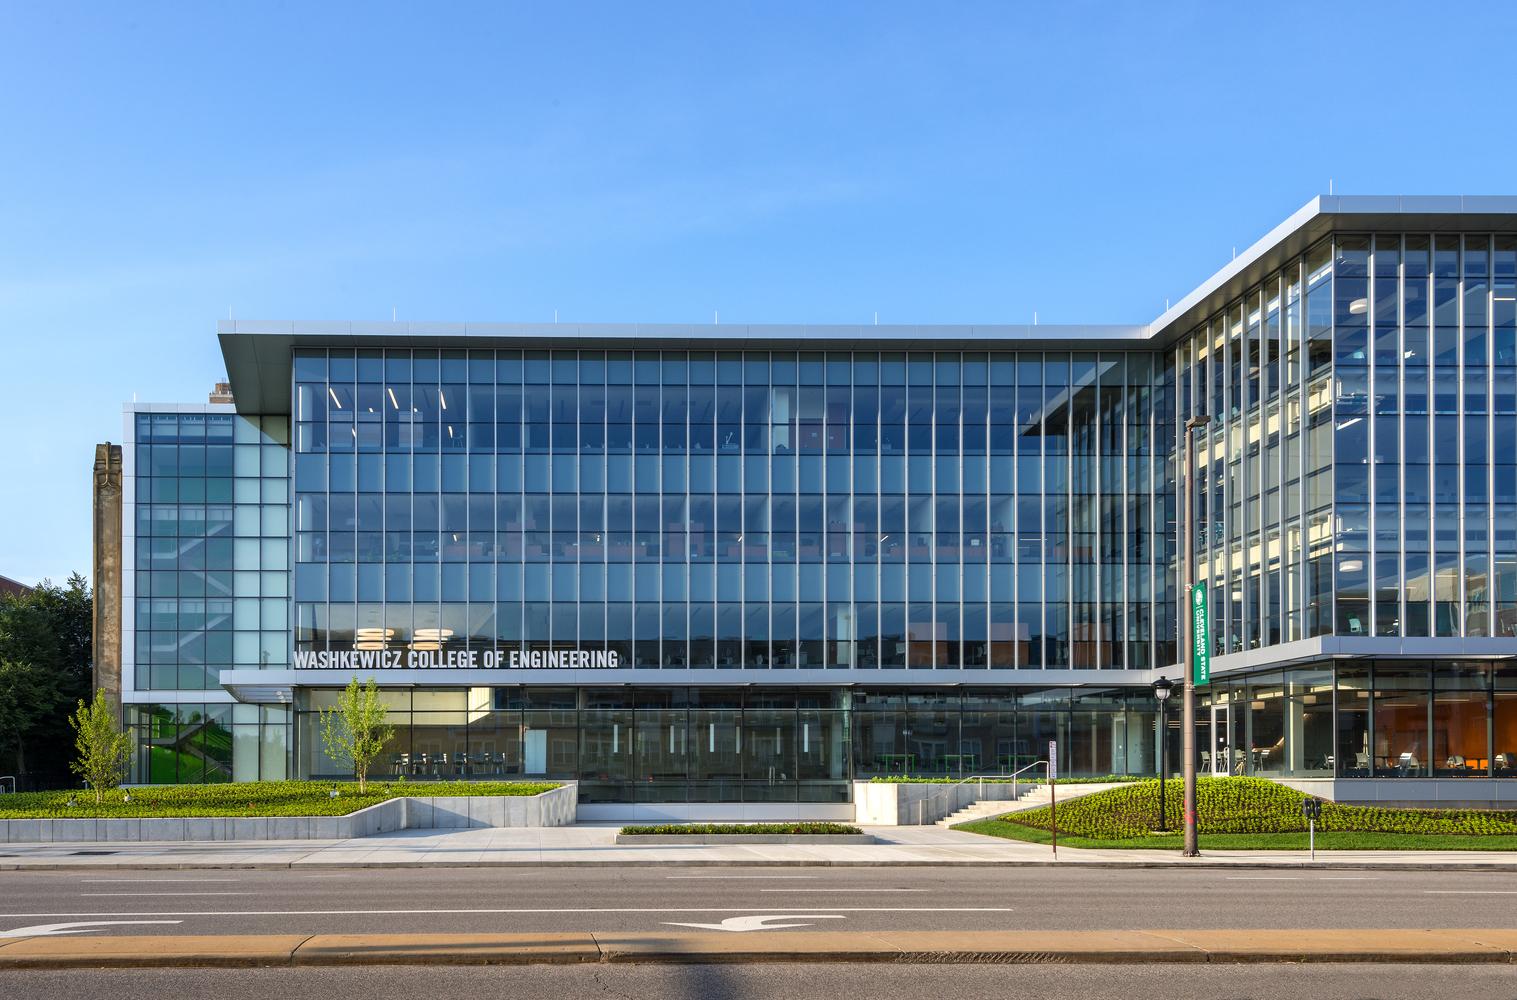 Washkewicz College of Engineering / HED + CBLH Design